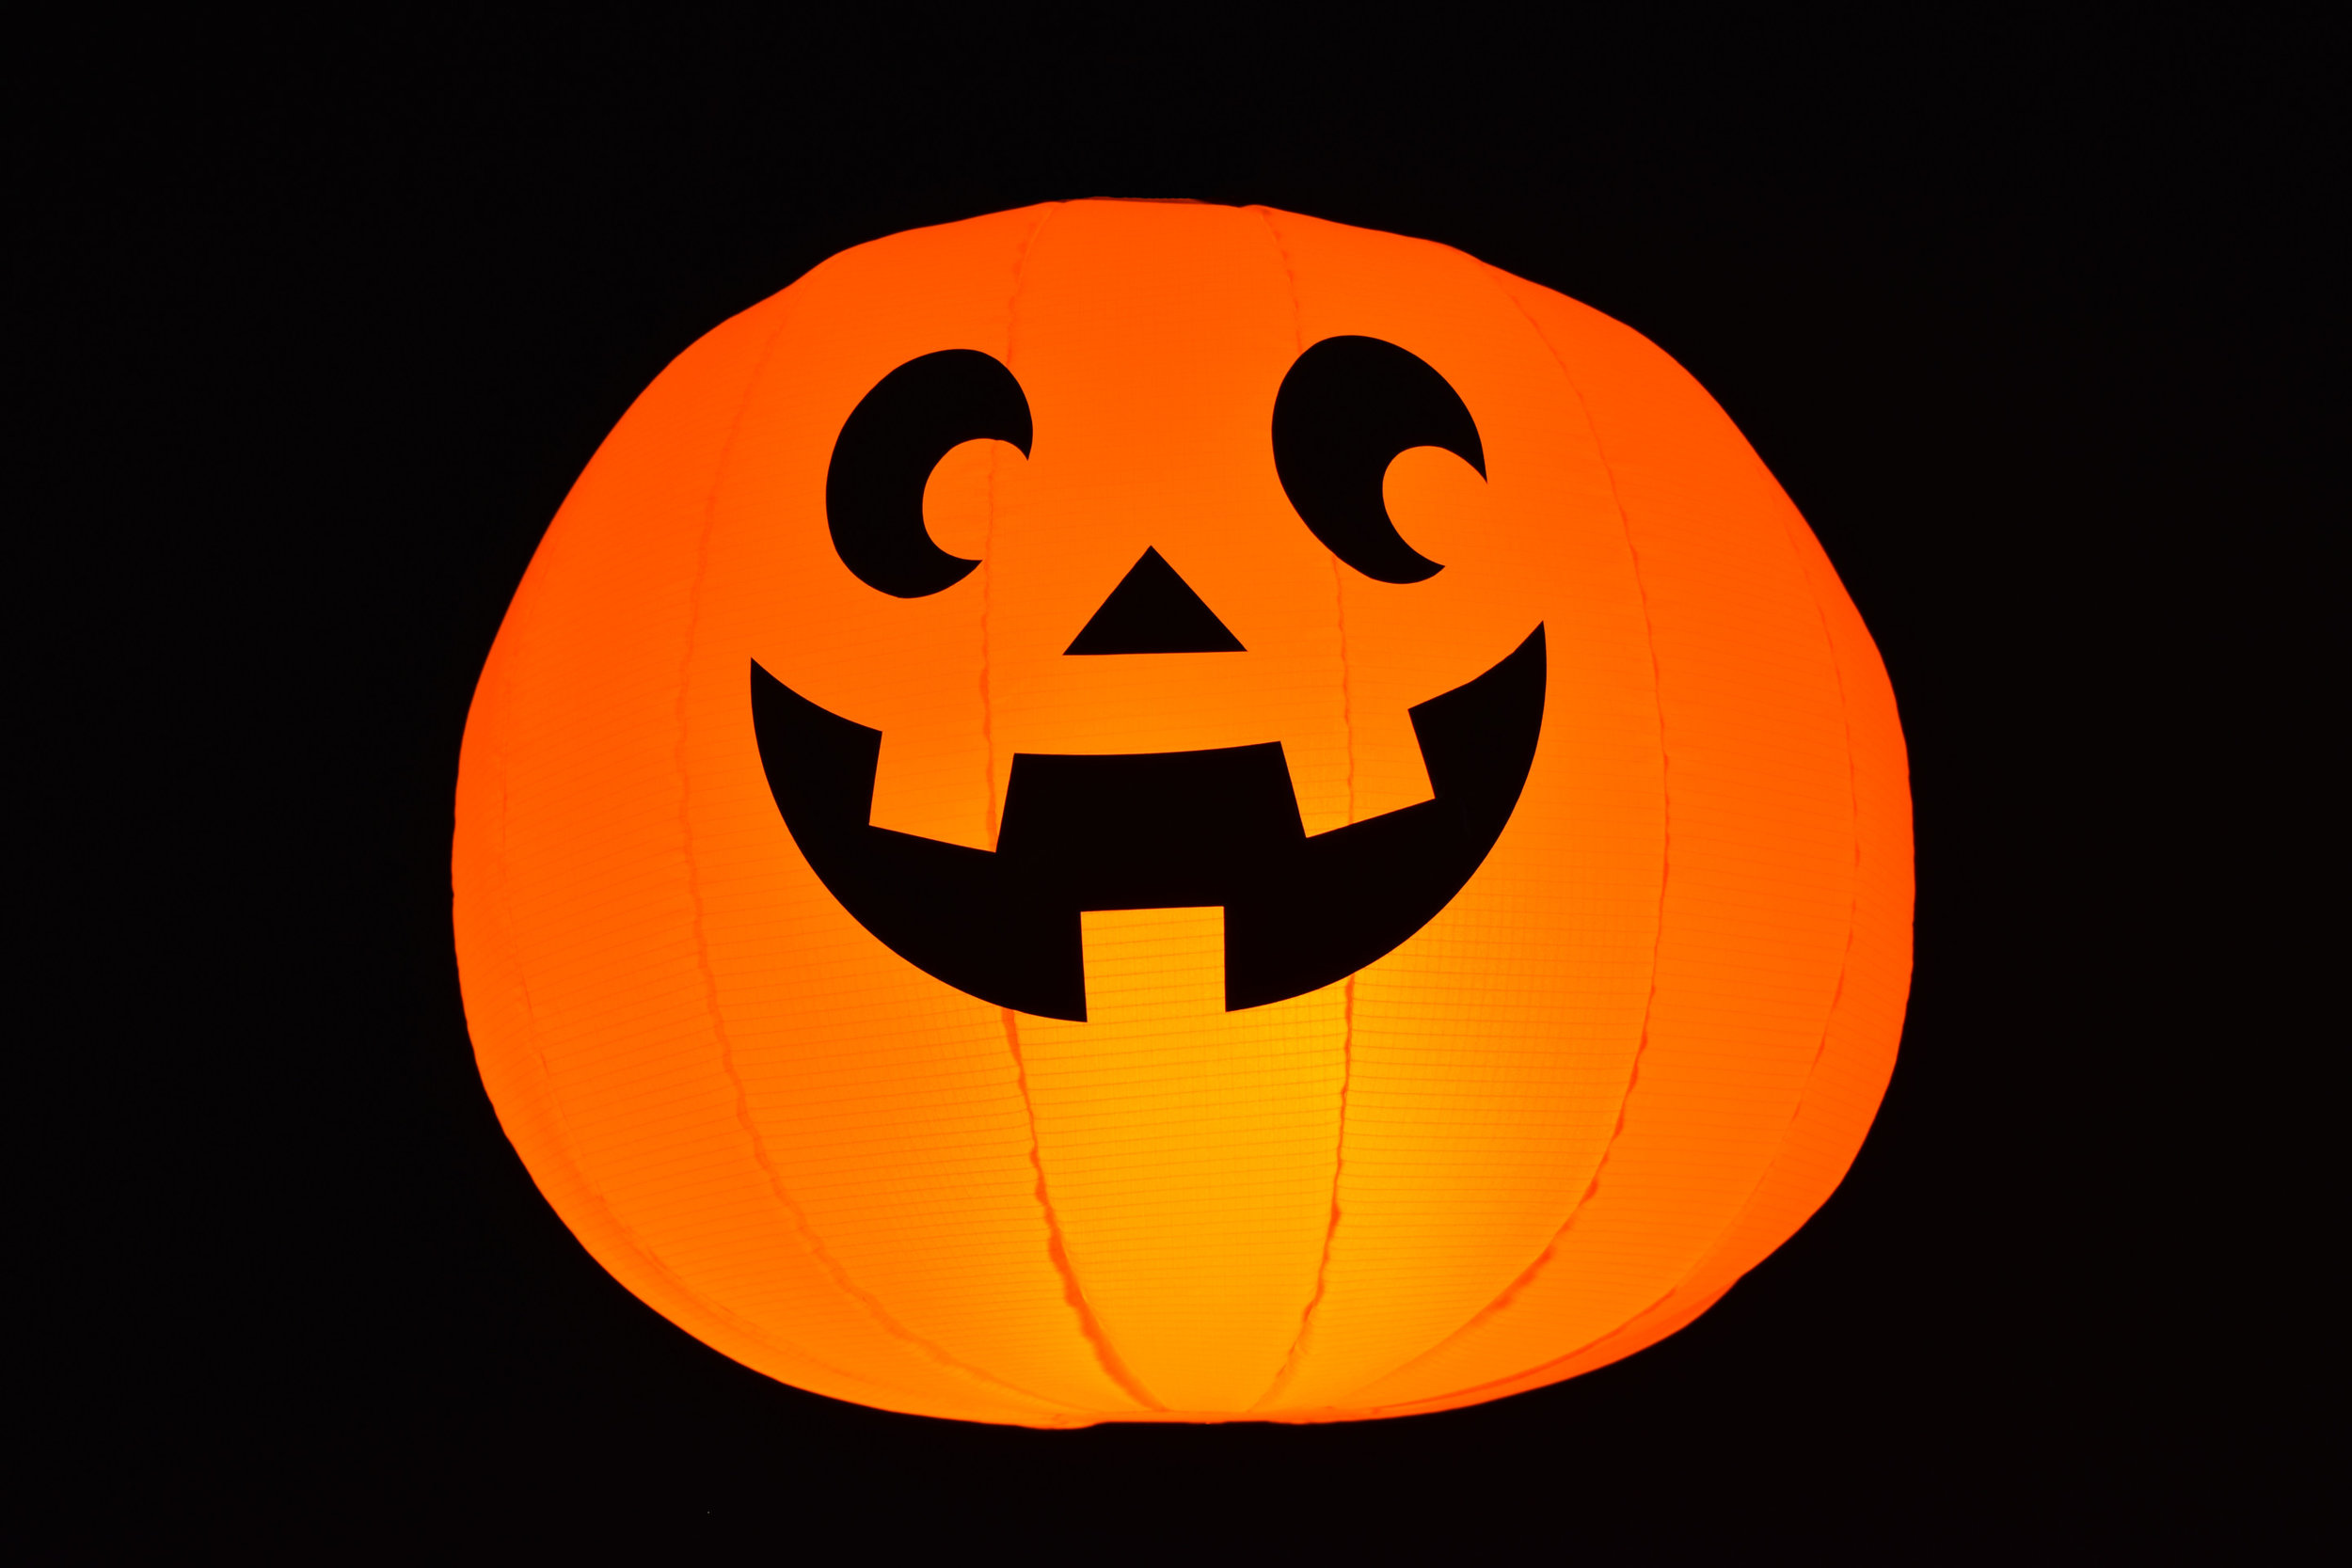 Jack-o-lantern-a--uai-2880x1920.jpg